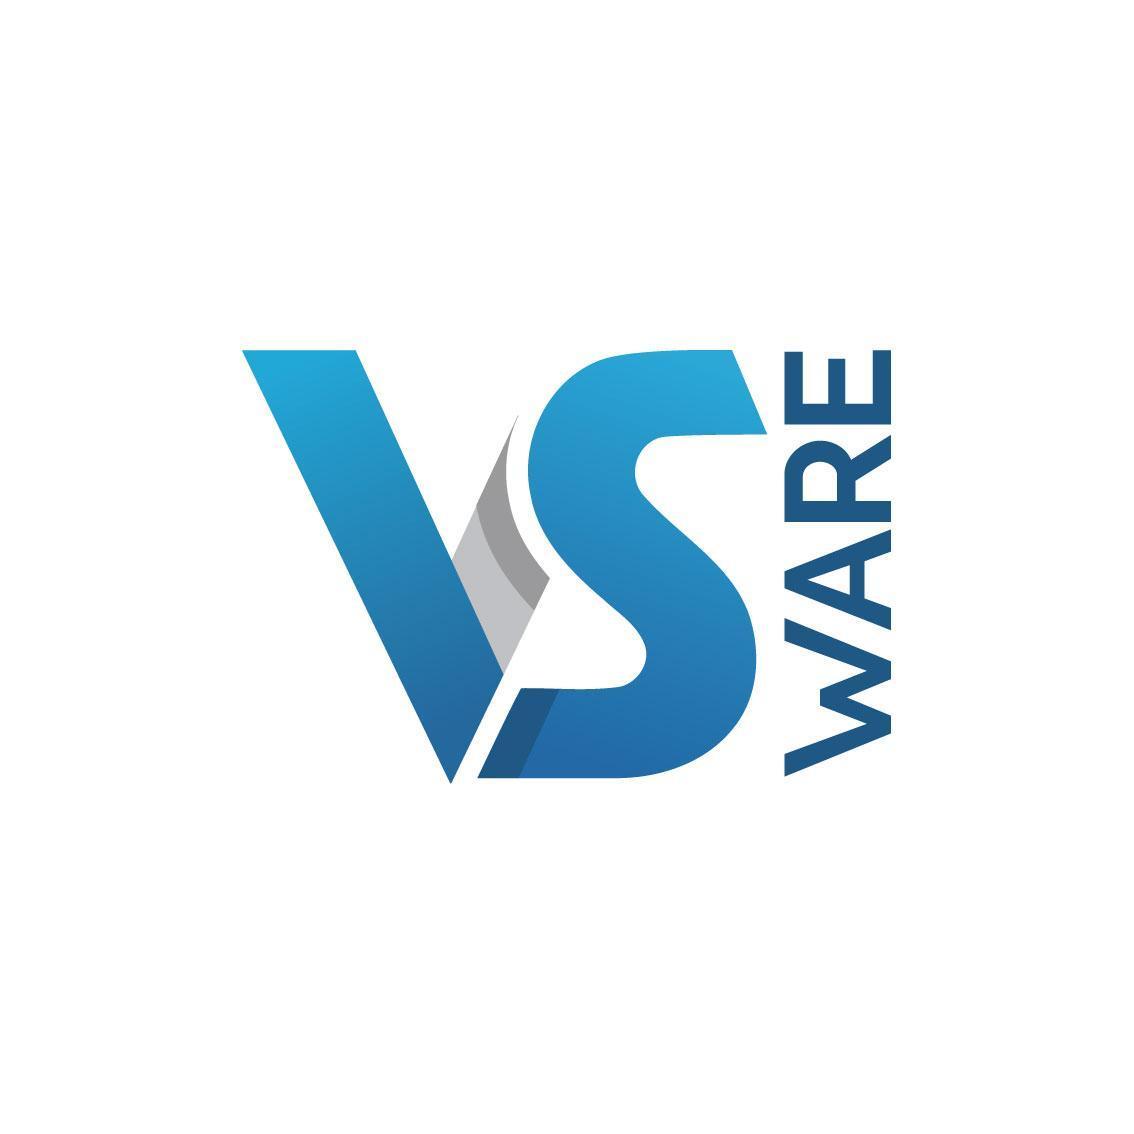 Day 2 - VSware Admin Course - Athlone - March 7th